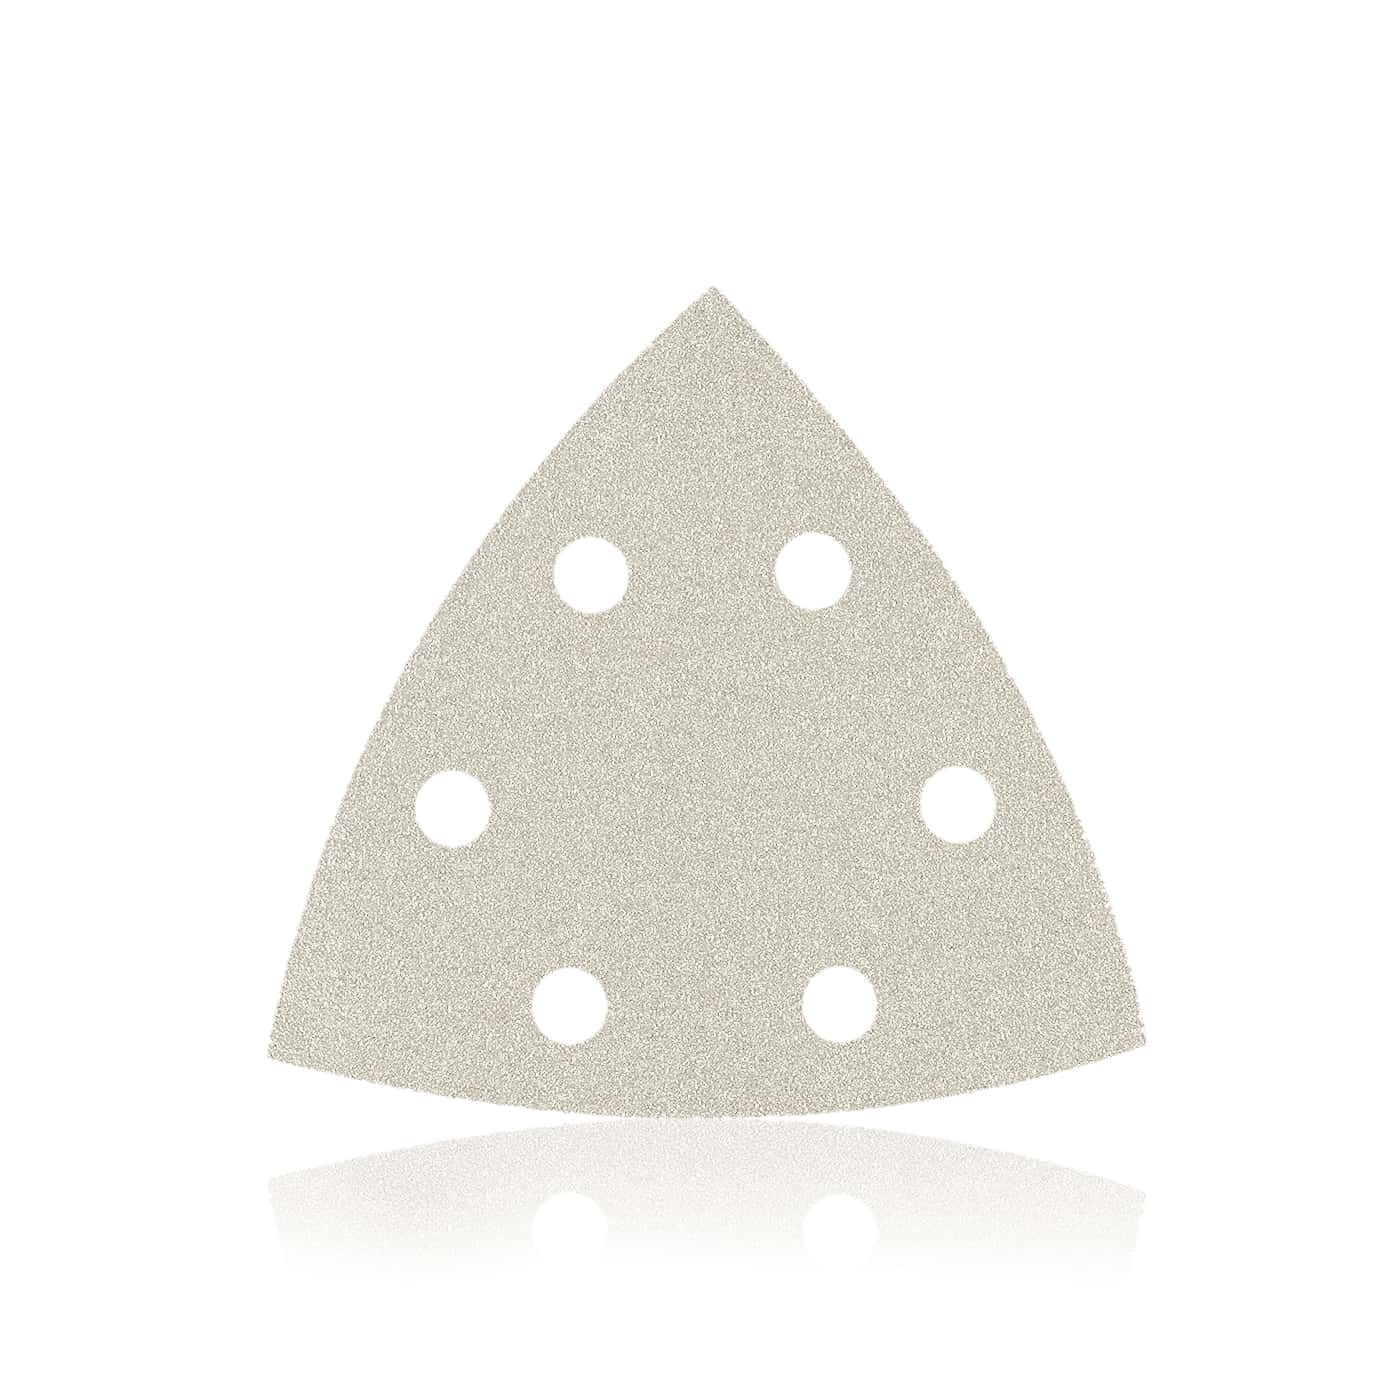 smirdex-510-white-line-velour-delta-sheets,marine,automotive,sanding,valueformoney,sanding,open coat,clogging,loading